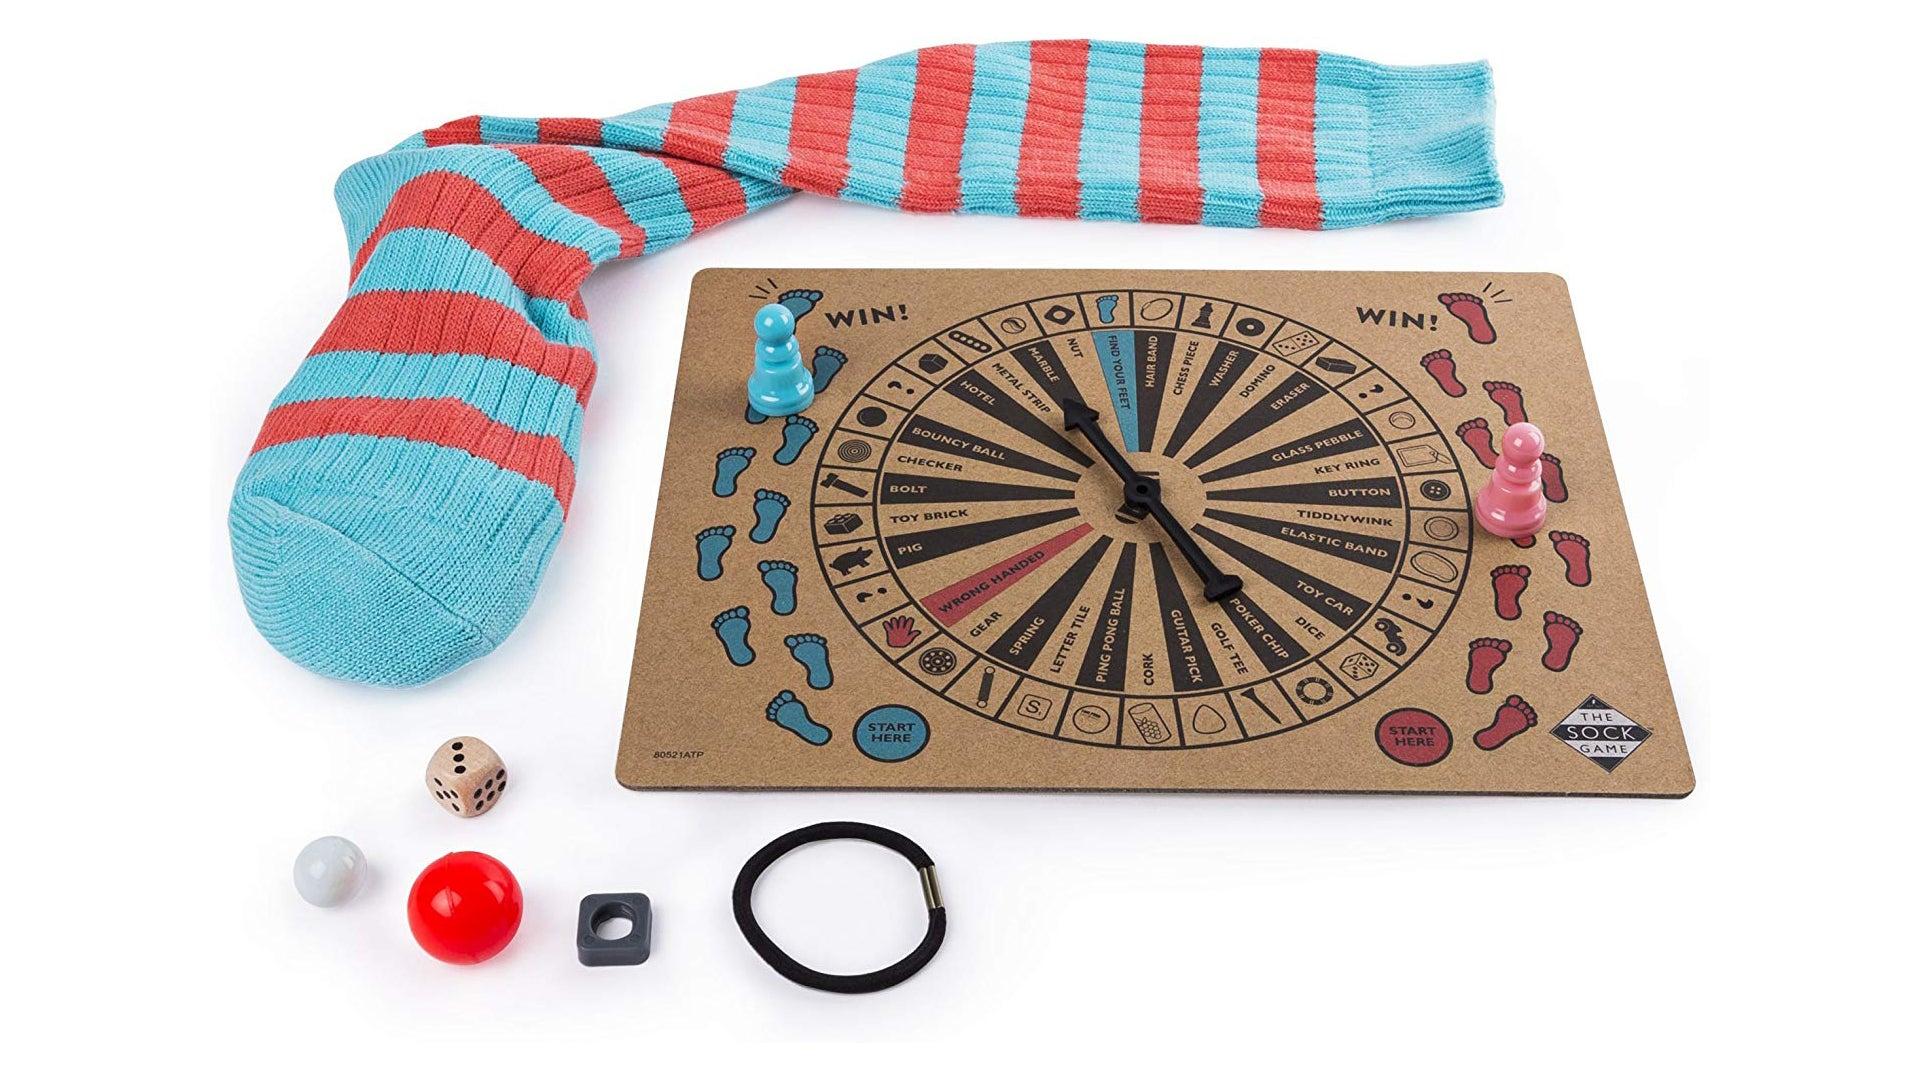 the-sock-game-family-board-game.jpg